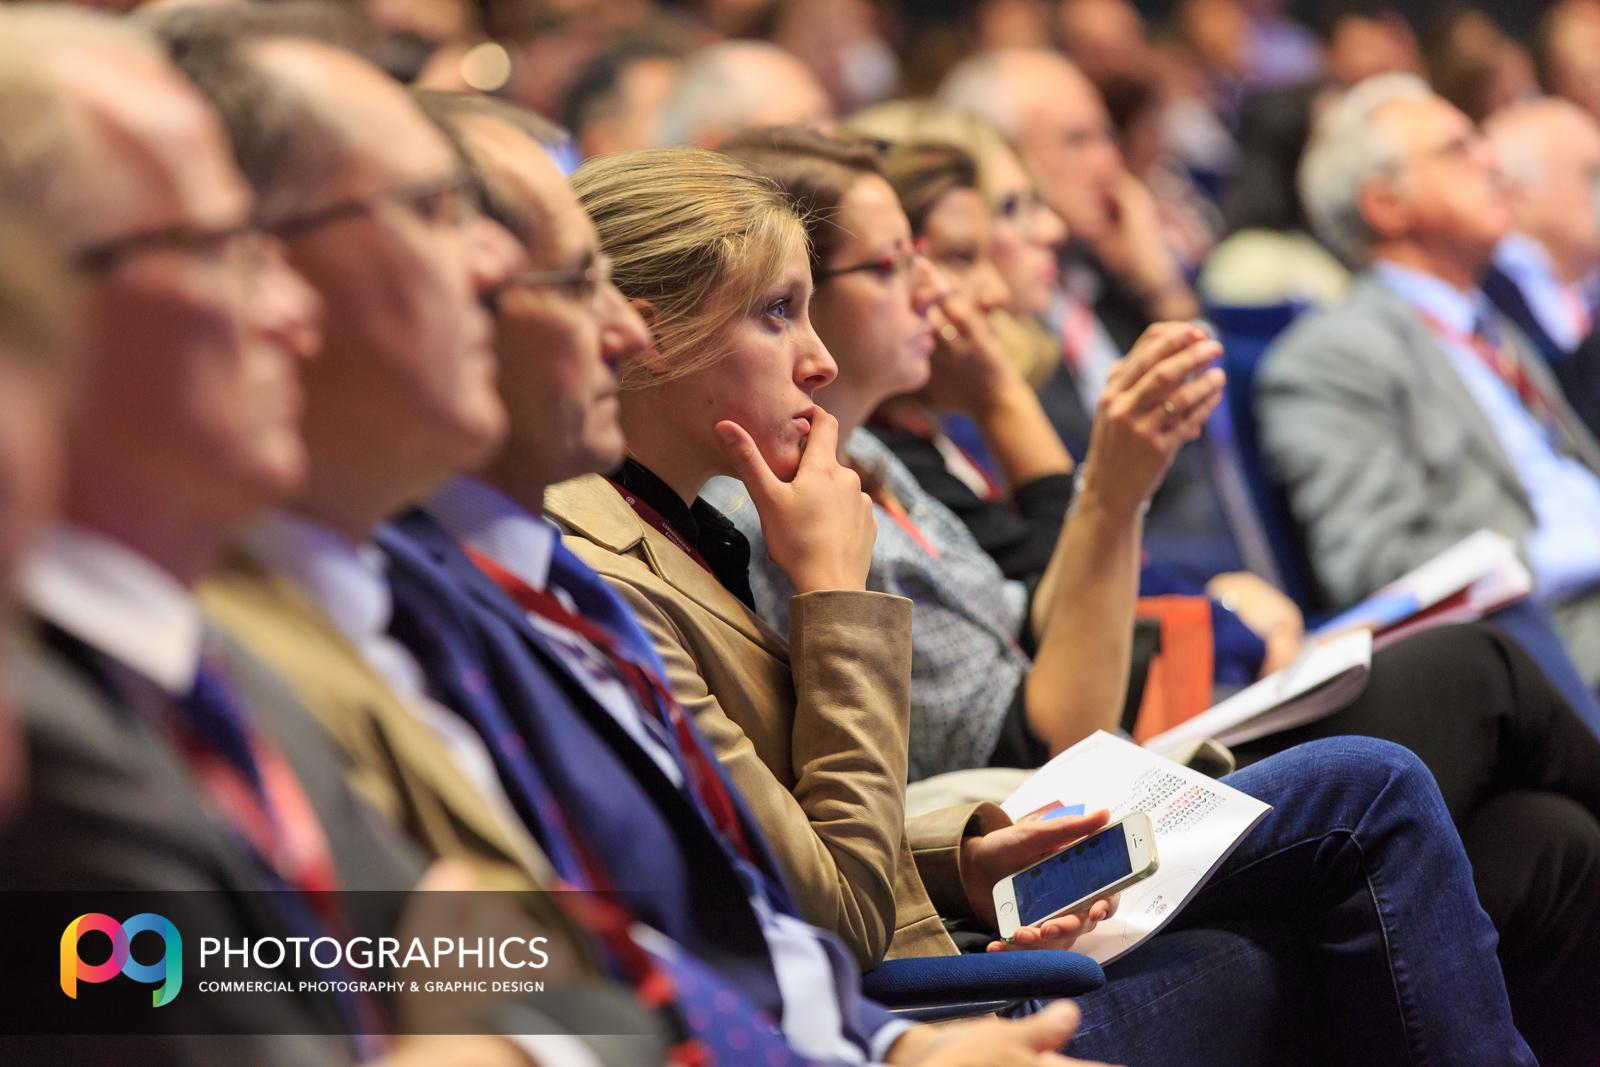 ESCR-2018-conference-event-photography-UK-glasgow-edinburgh-11.jpg